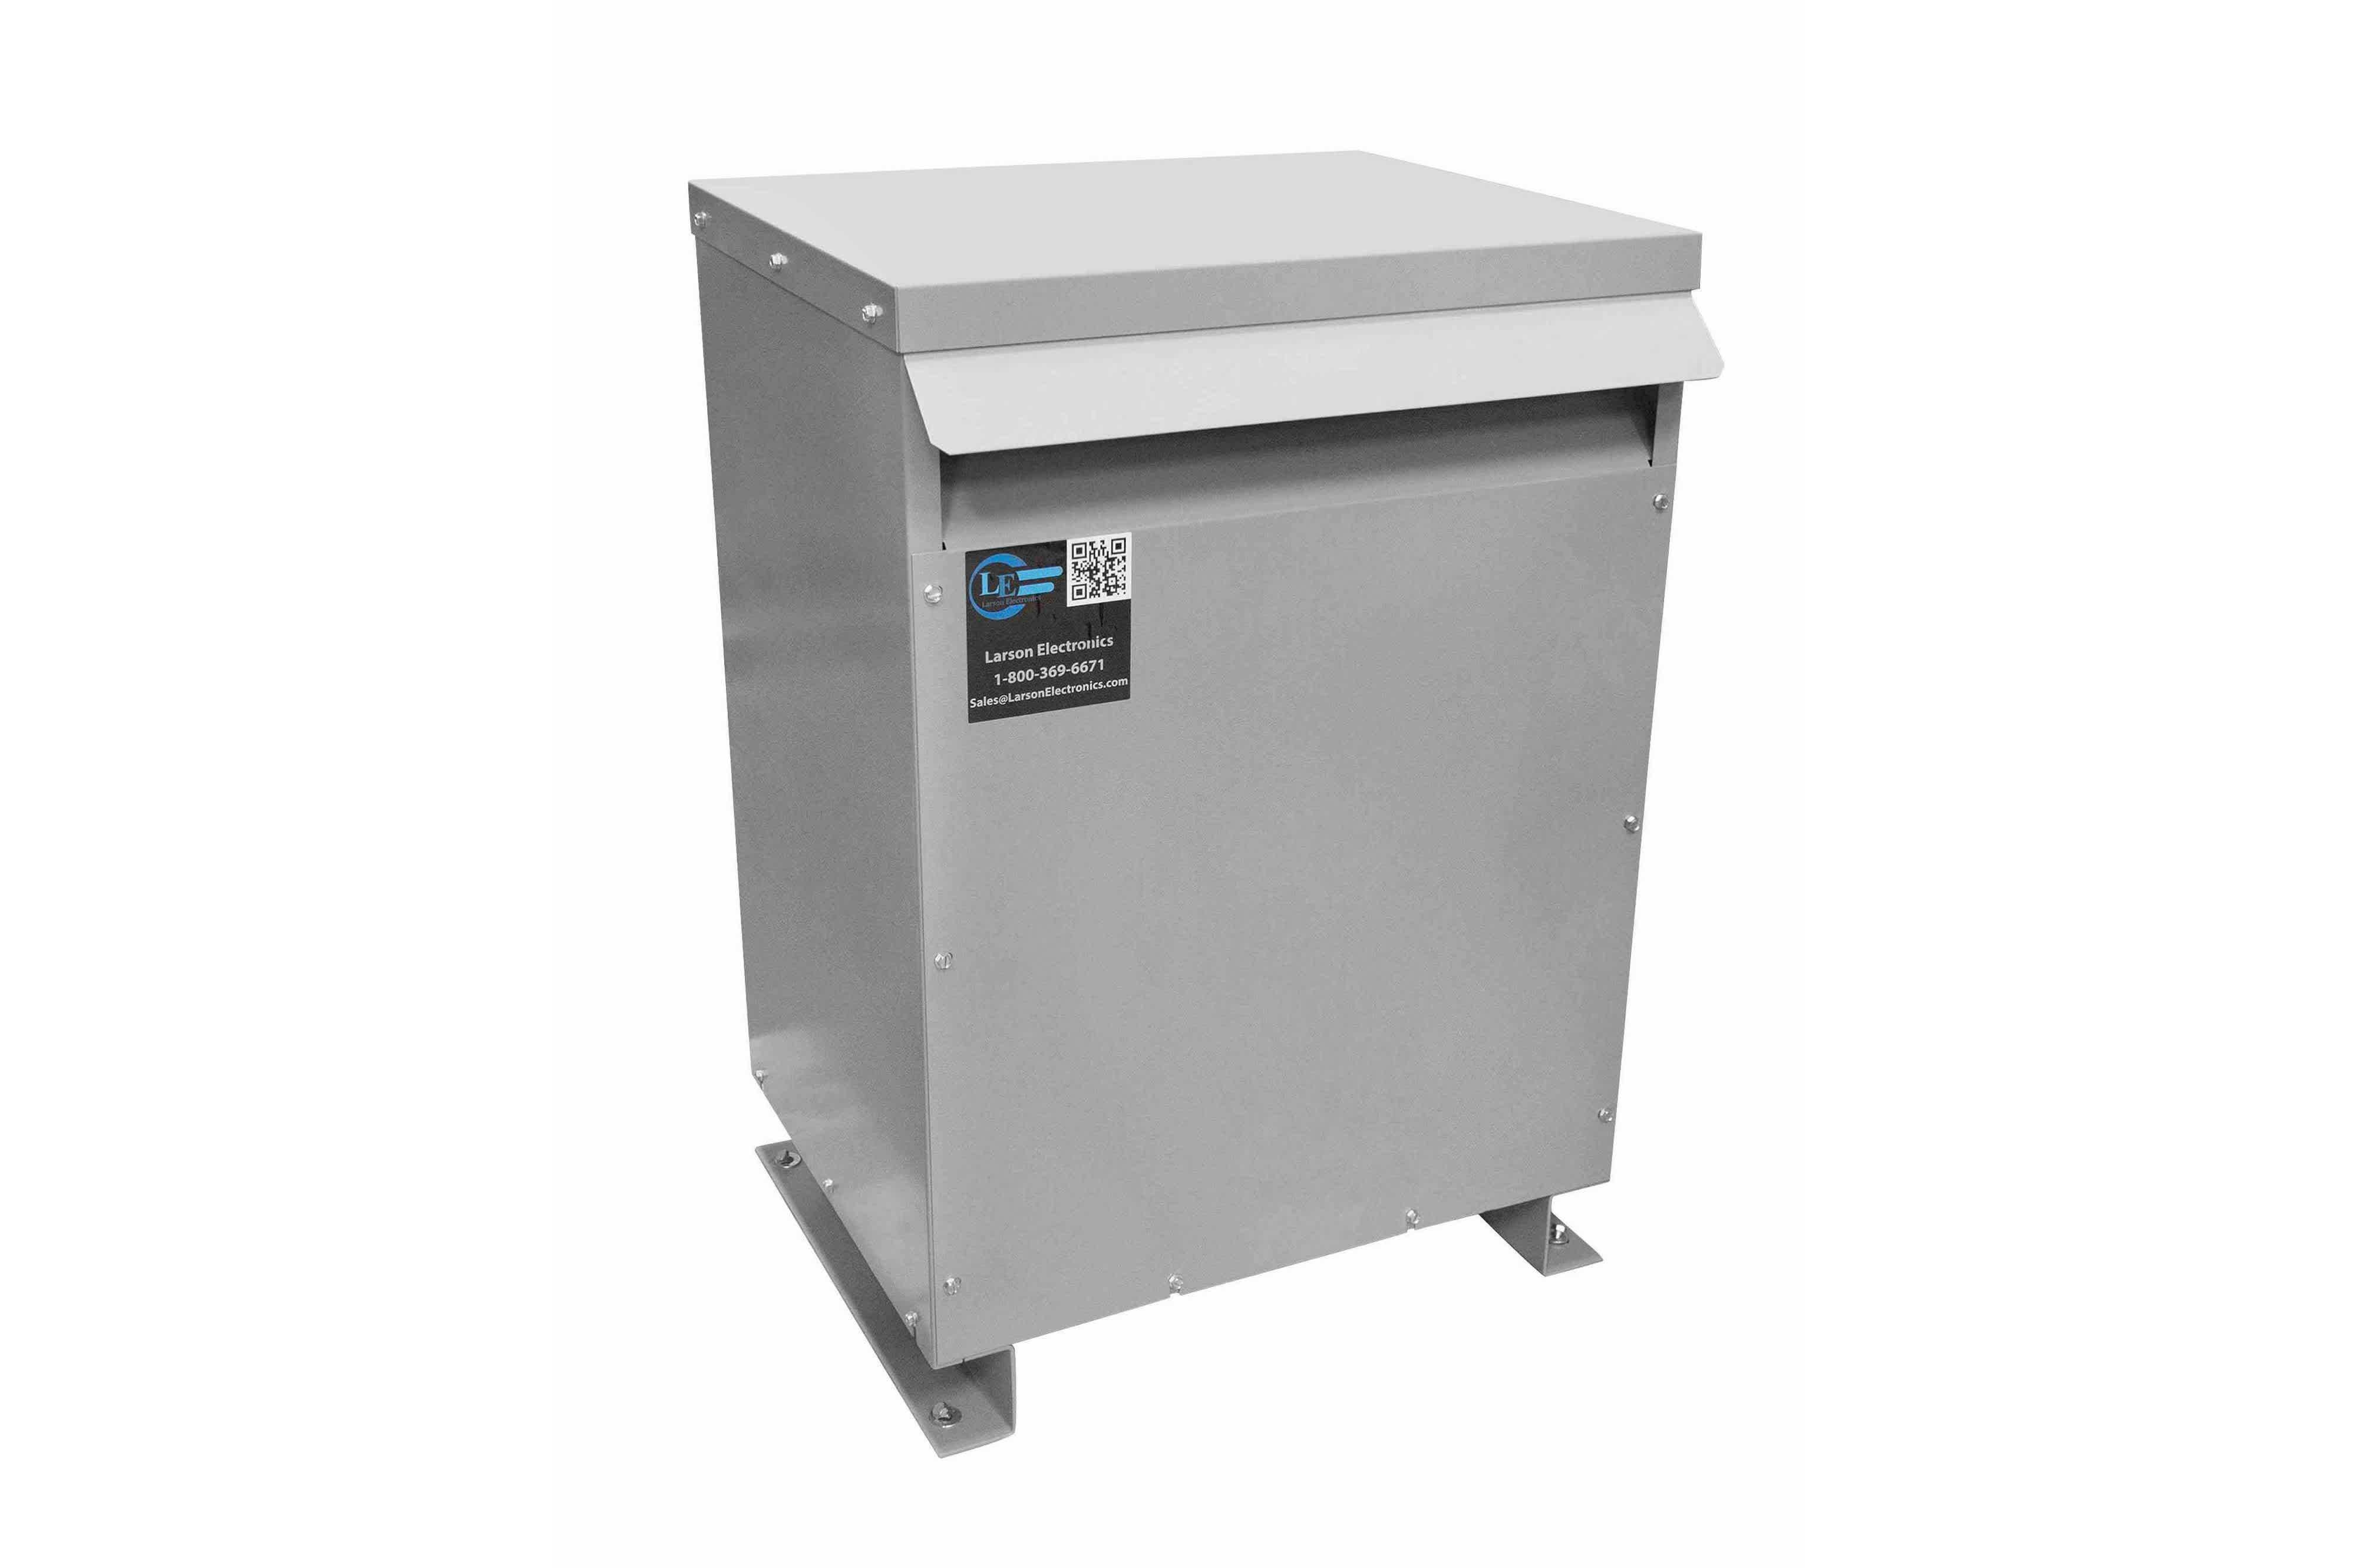 45 kVA 3PH Isolation Transformer, 575V Wye Primary, 208Y/120 Wye-N Secondary, N3R, Ventilated, 60 Hz